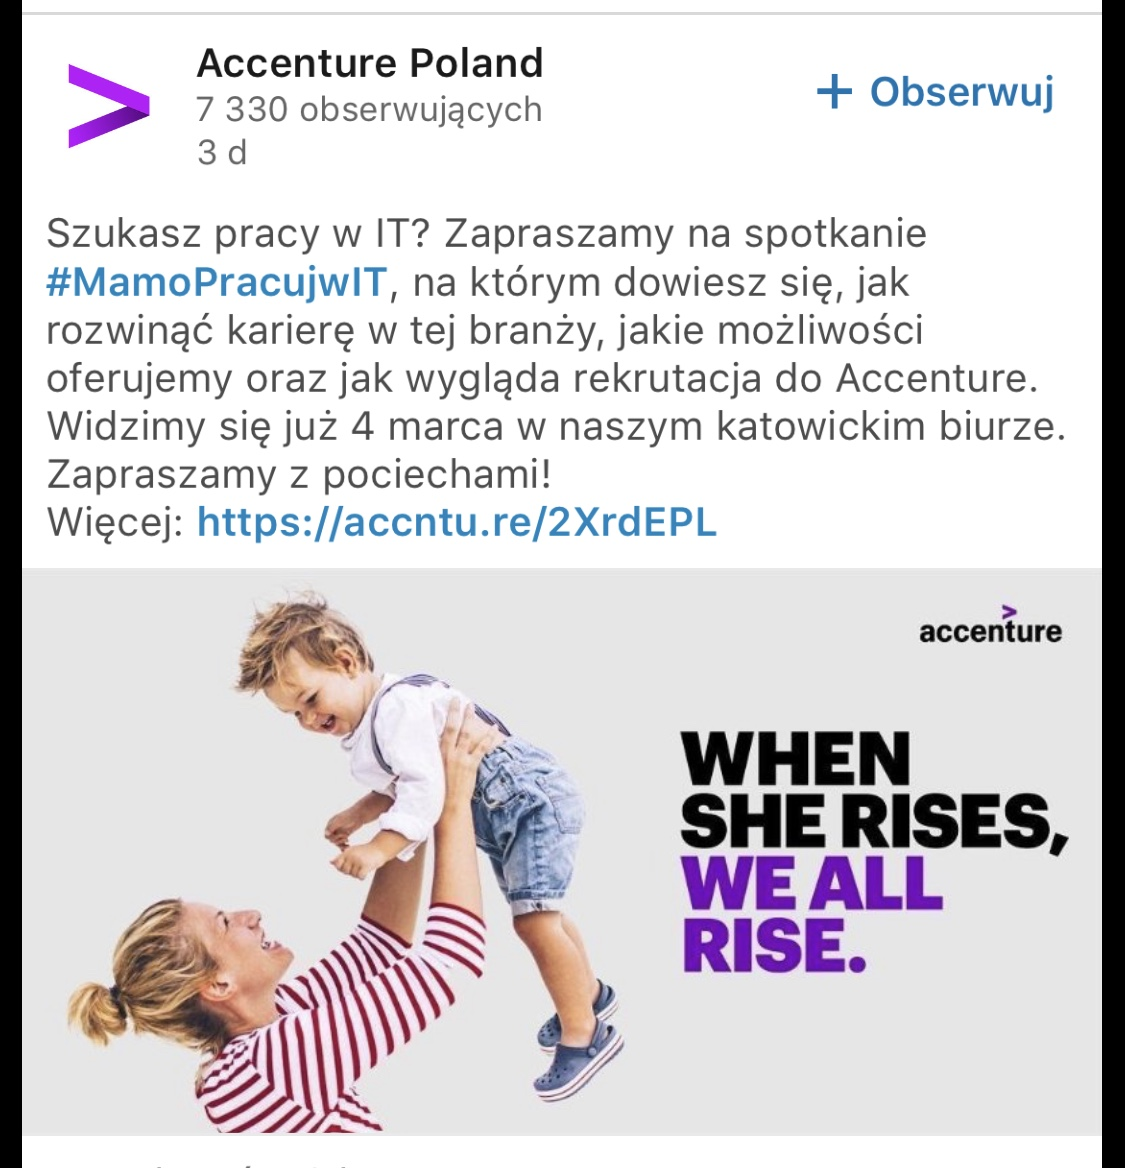 Accenture diversity